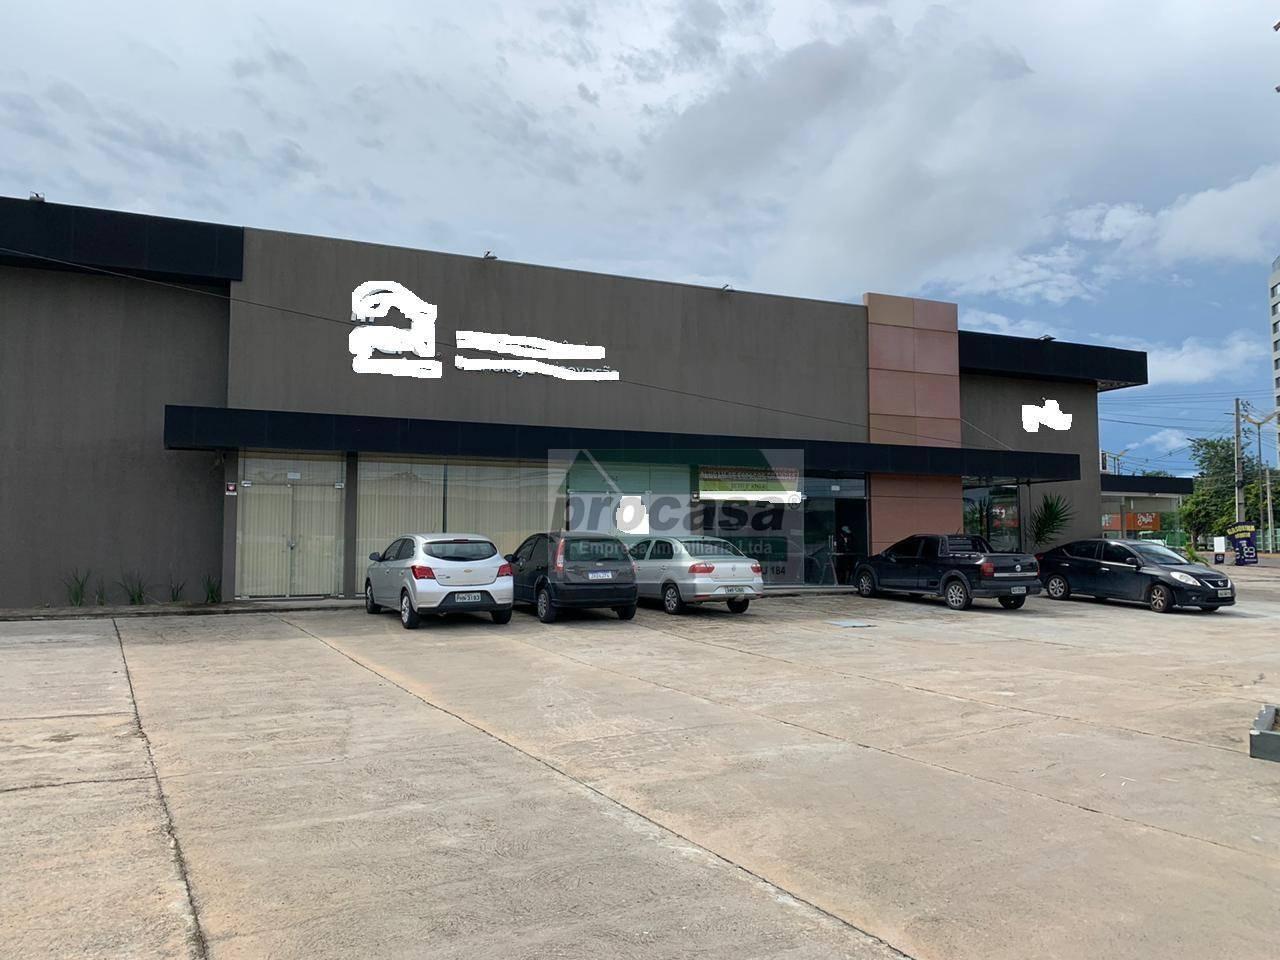 Loja para alugar, 247 m² por R$ 8.750/mês - Distrito Industrial I - Manaus/AM